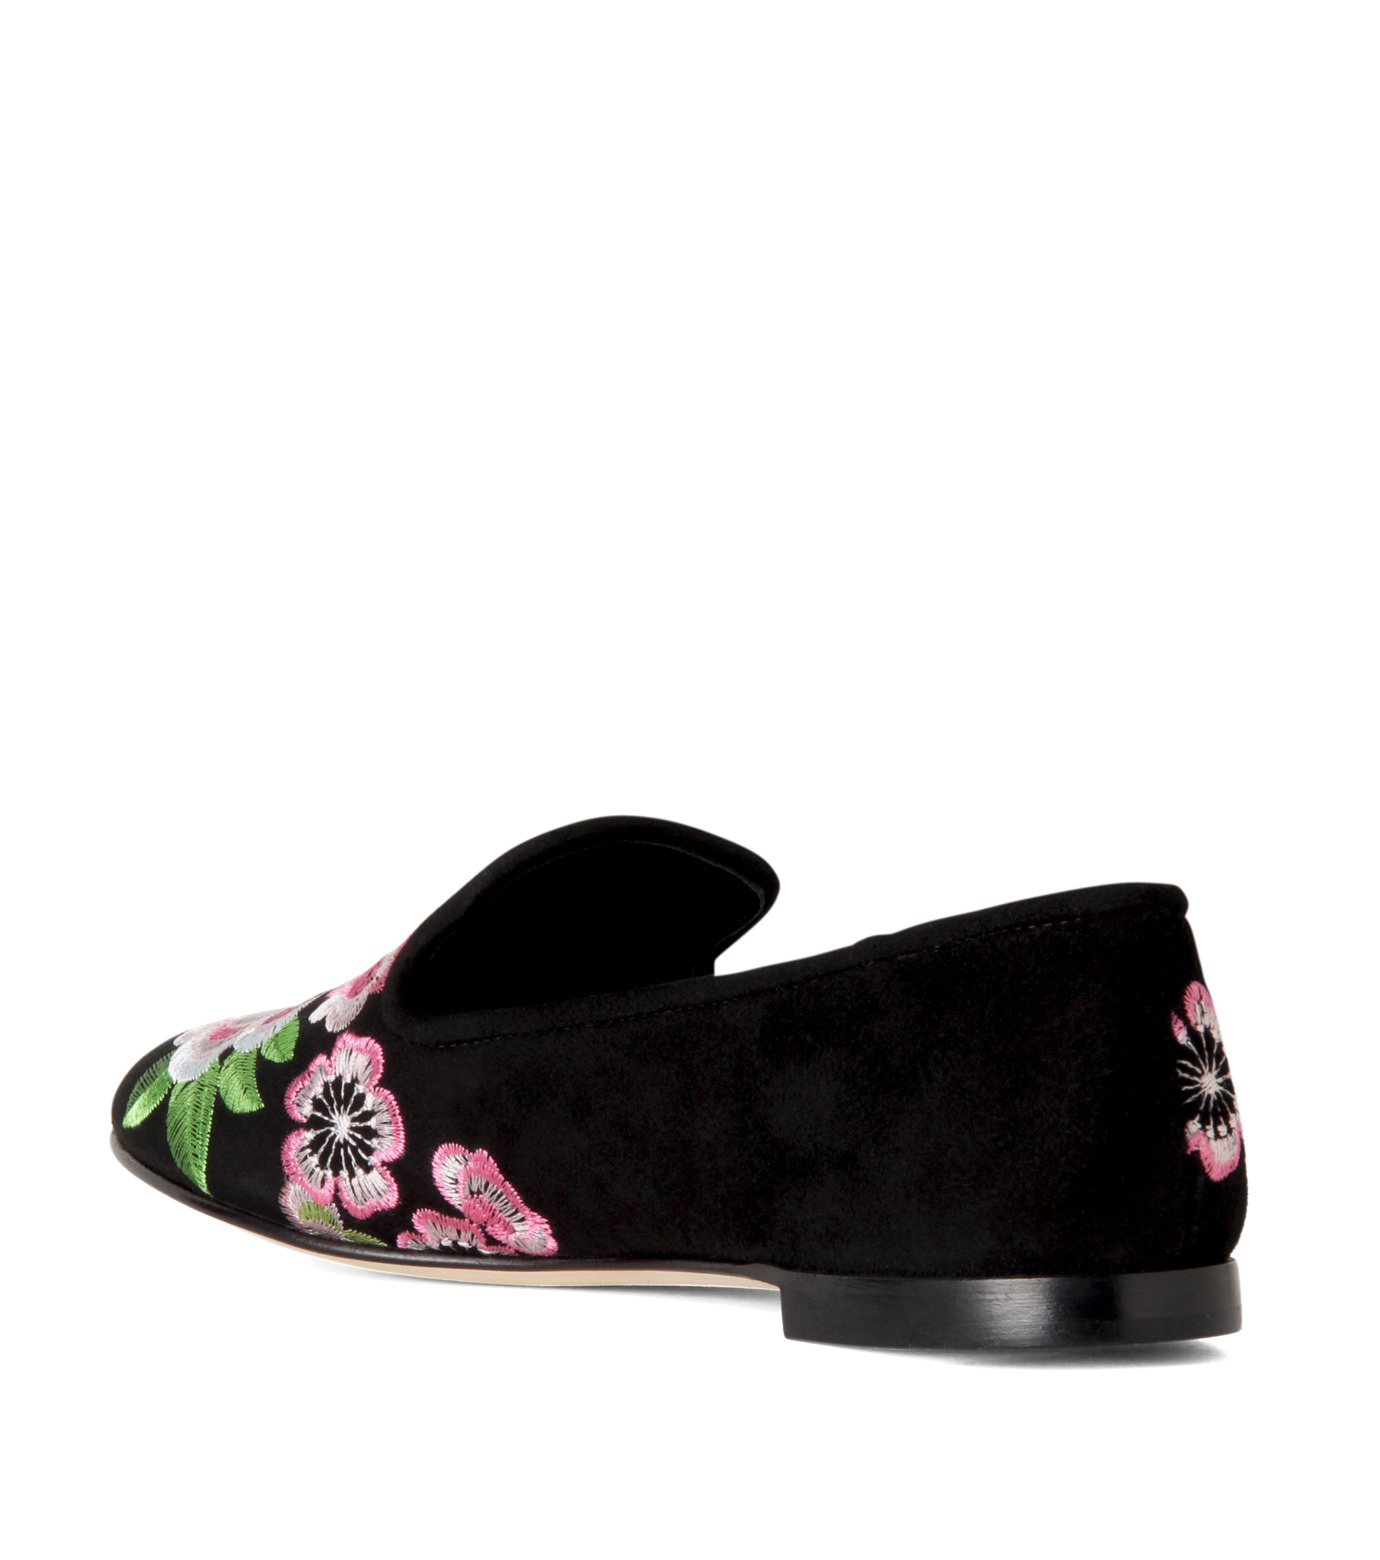 Giuseppe Zanotti Design(ジュゼッペザノッティ)のFlower Embro Opera Shoes-BLACK(シューズ/shoes)-41-6187CA005-13 拡大詳細画像2